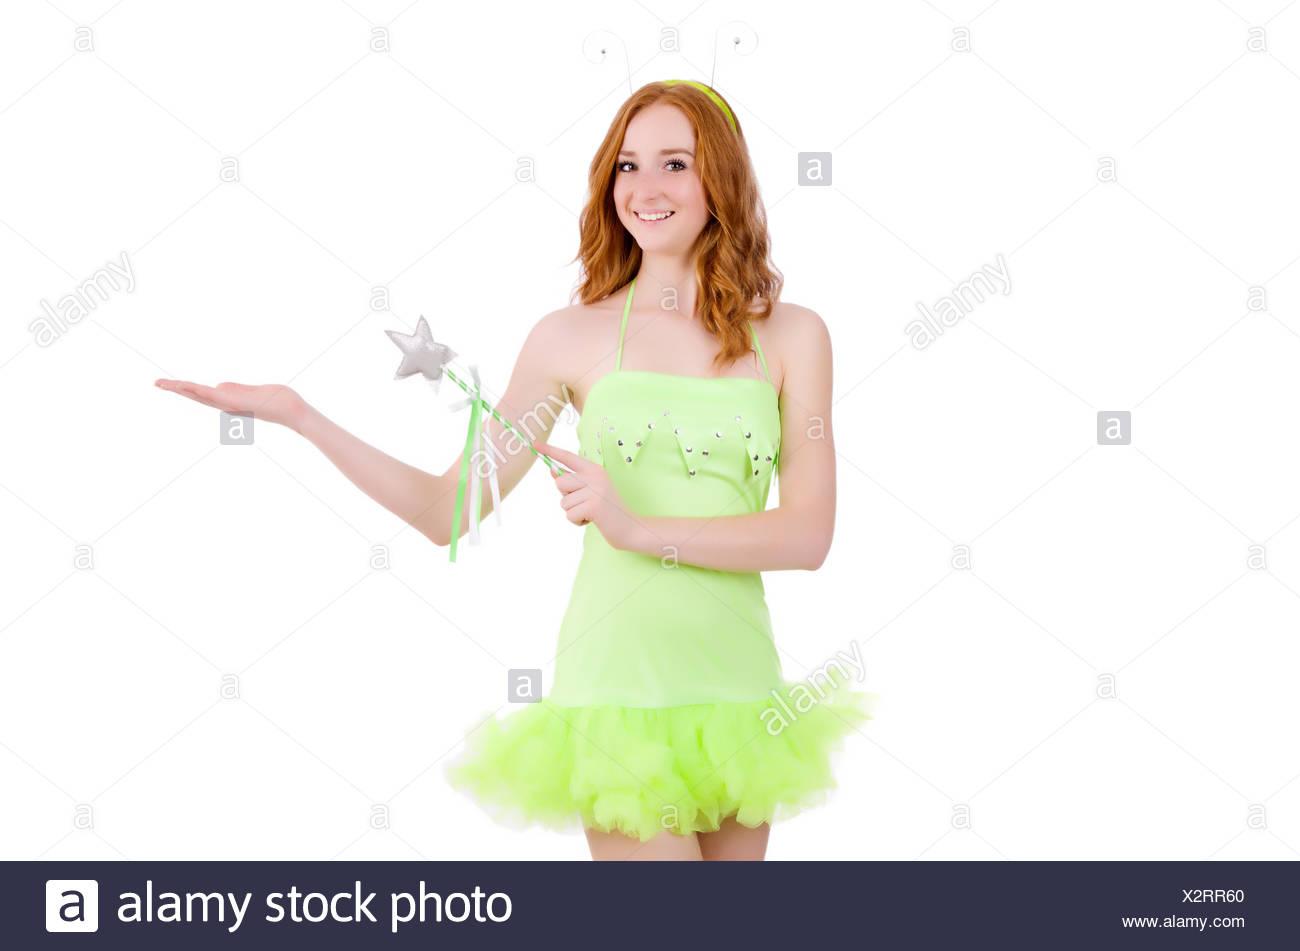 b4d794358c1 Pretty Teenager In Red Mini Dress Stockfotos   Pretty Teenager In ...